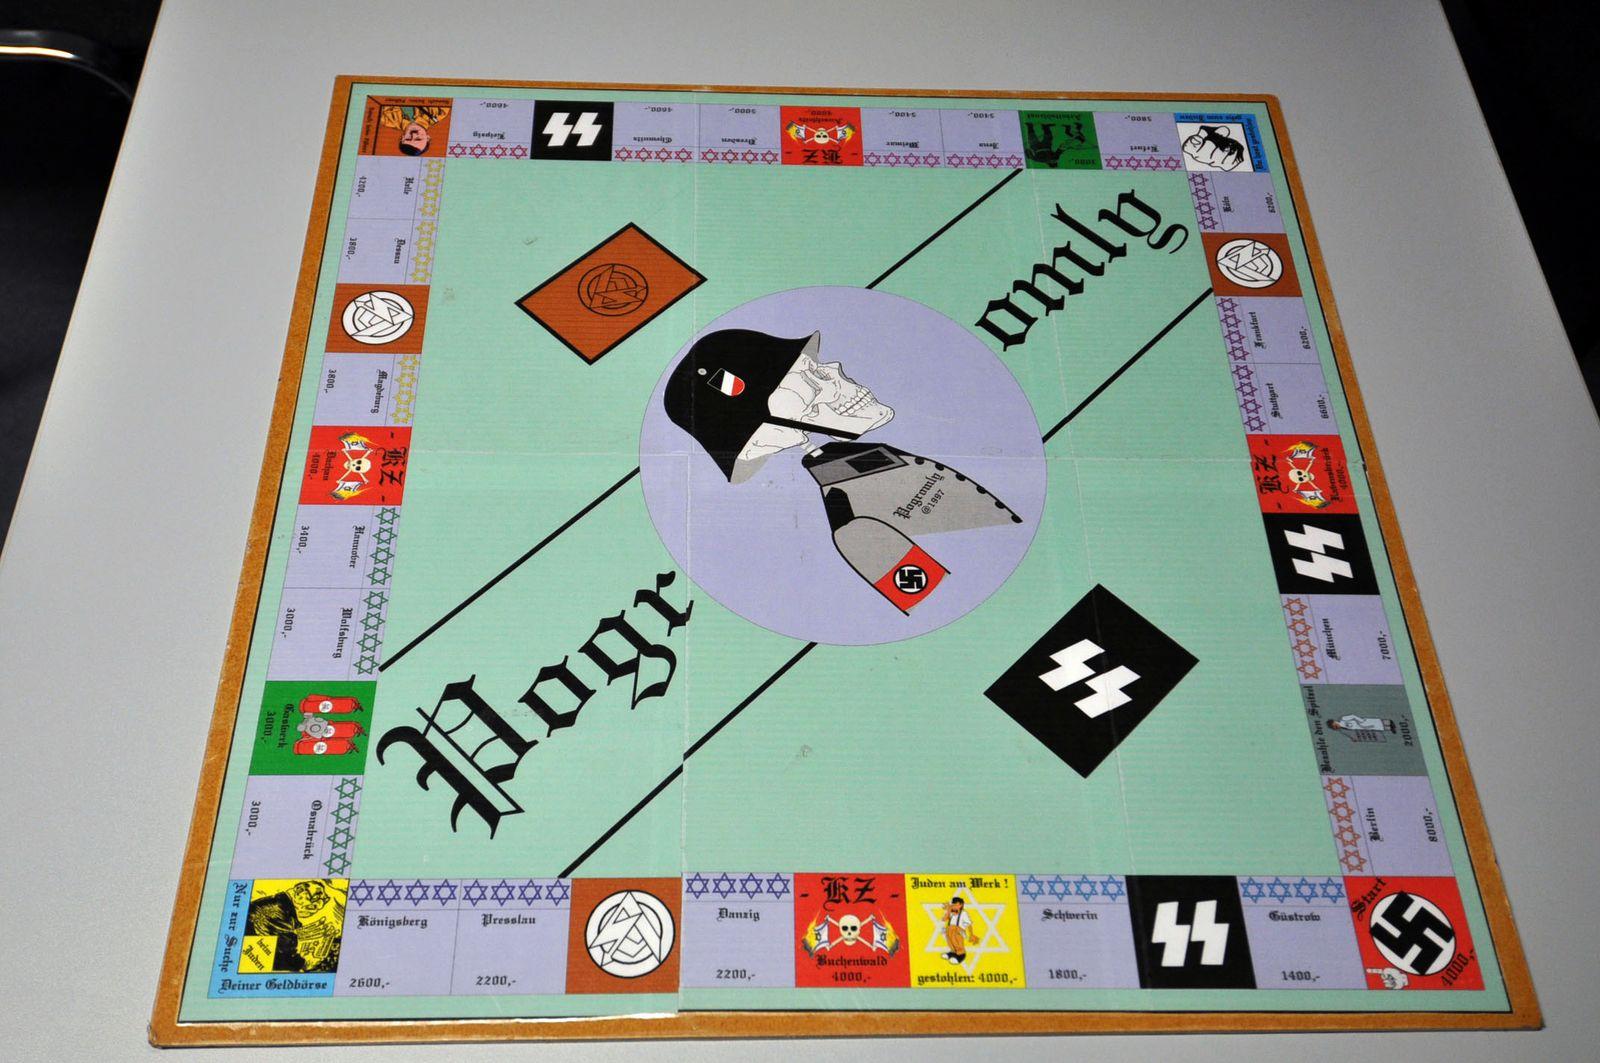 Neonazi-Monopoly/ Pogromly